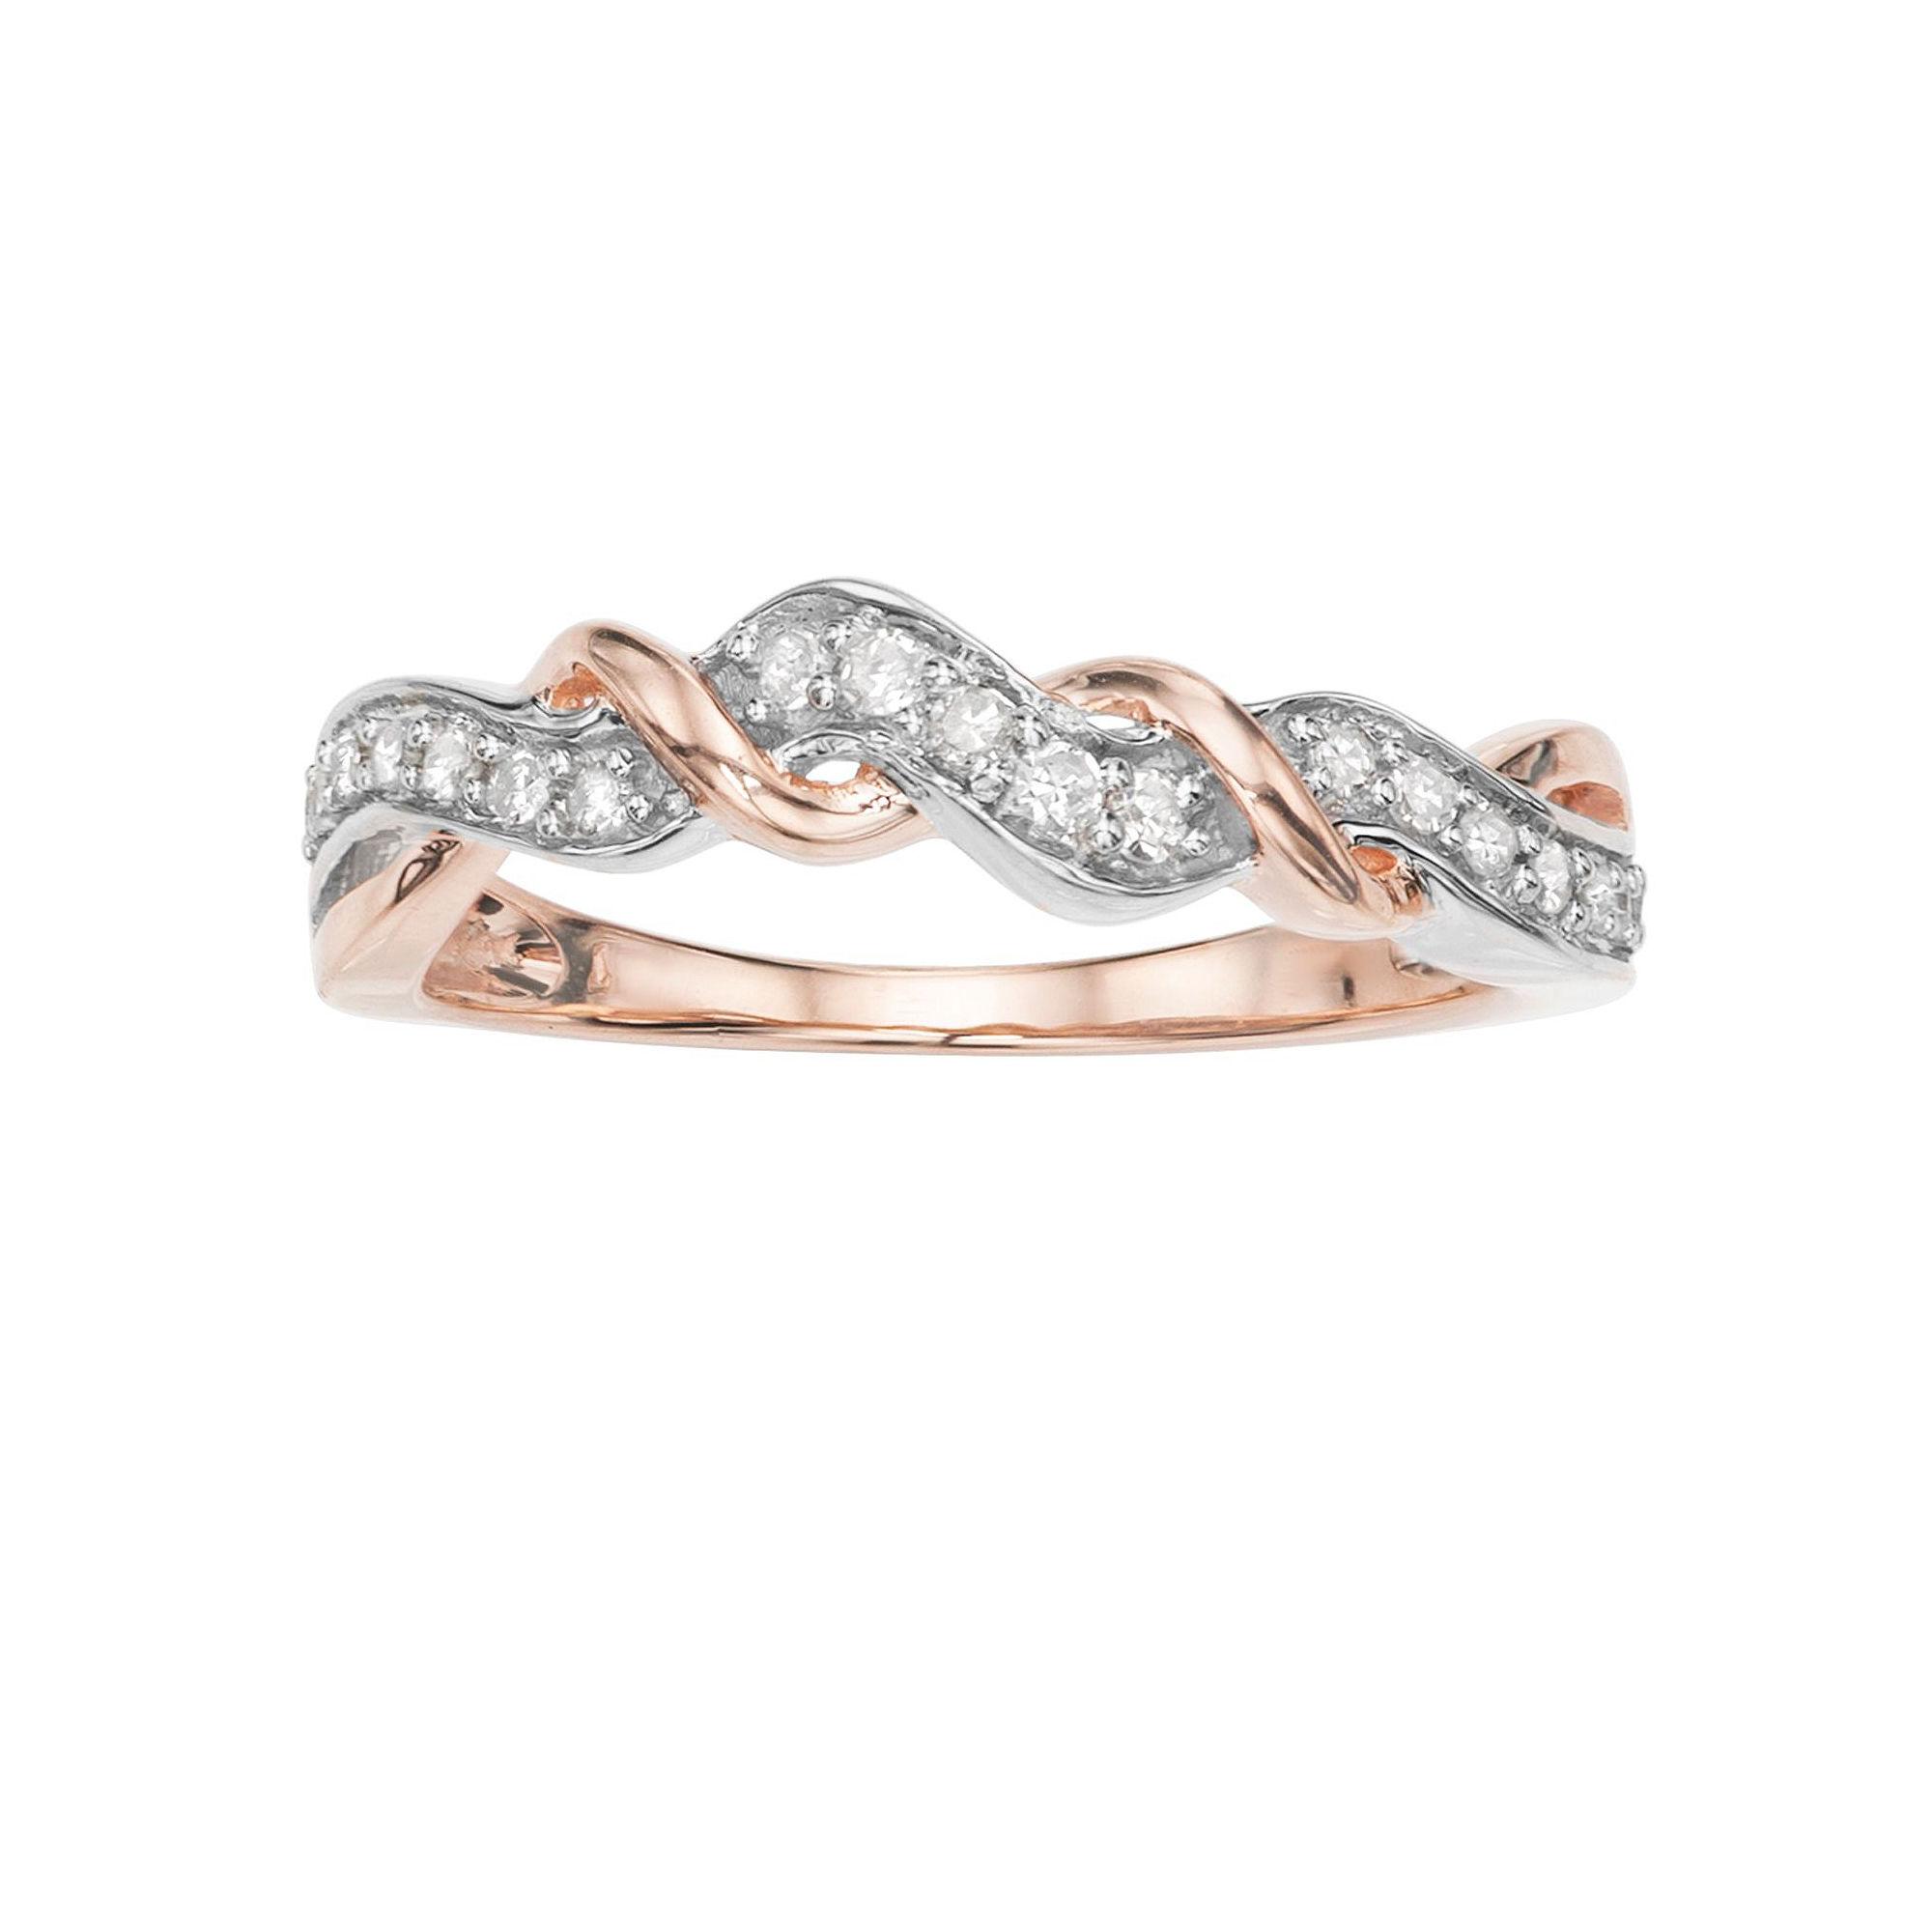 Womens 1/5 CT. T.W. Genuine White Diamond 10K Gold Cocktail Ring